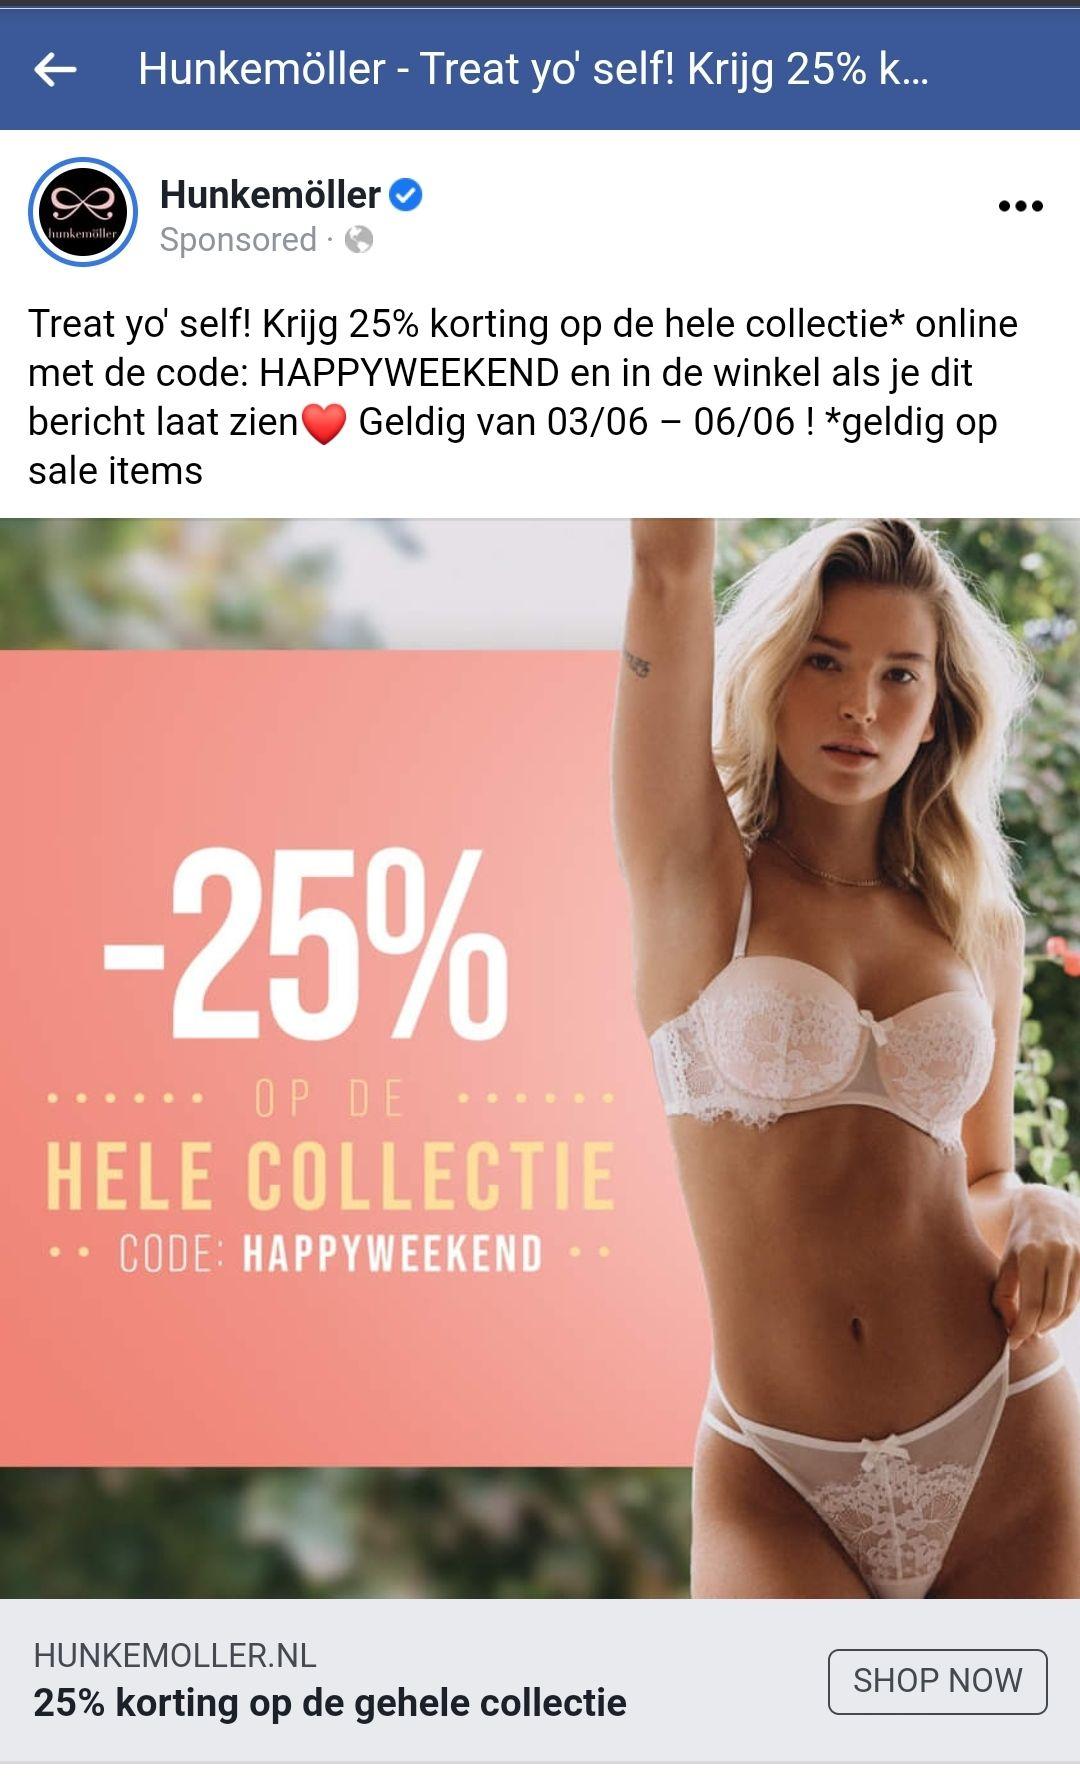 25% korting bij Hunkemöller